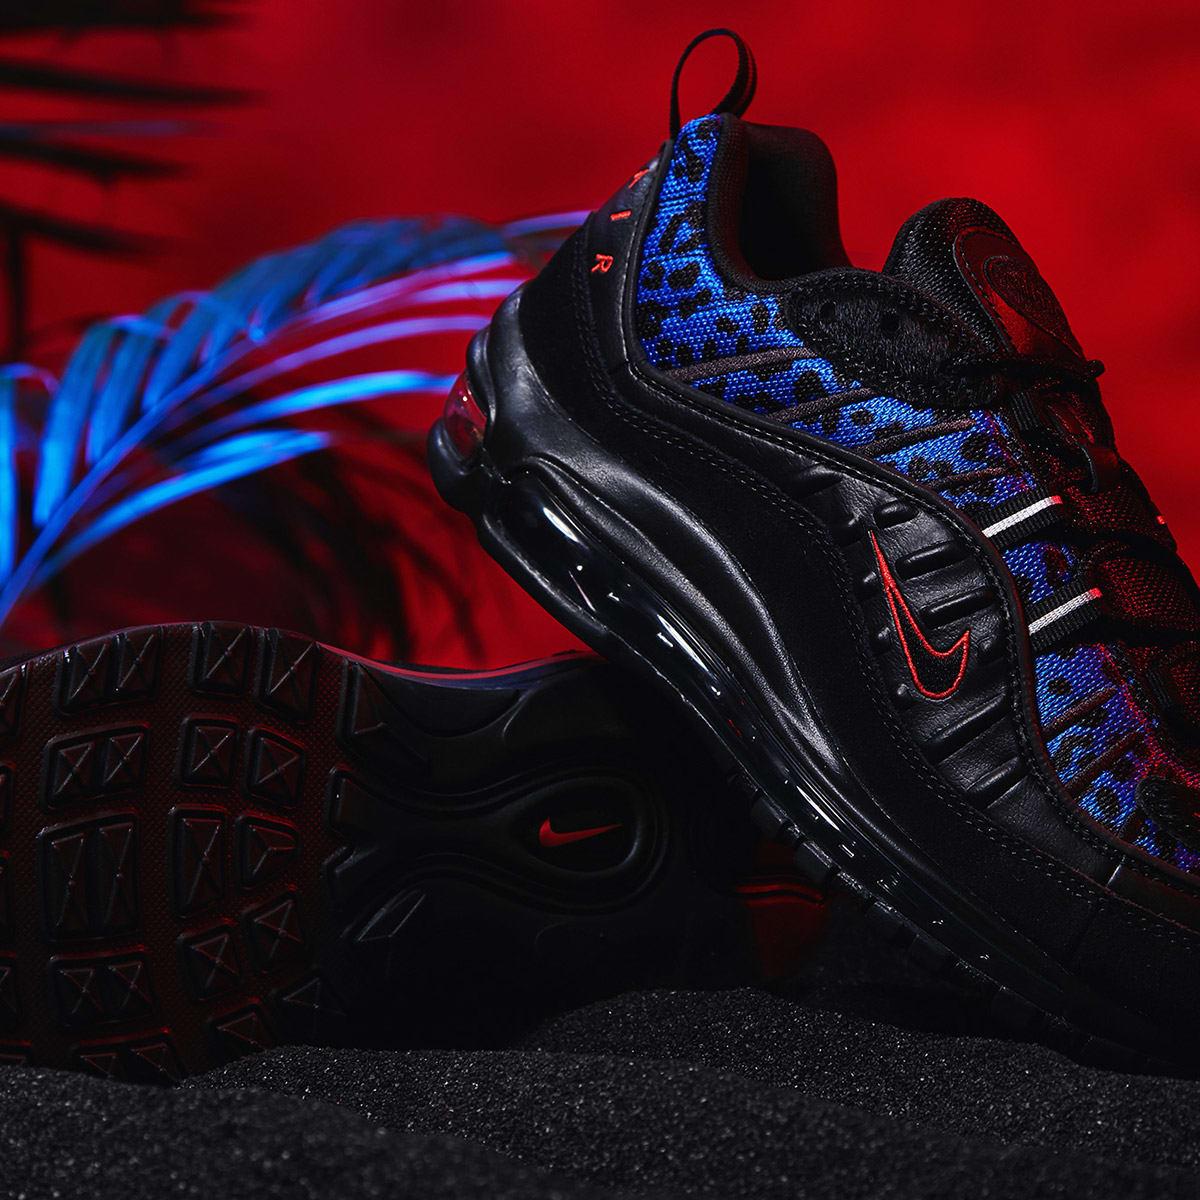 Nike Air Max 98 Premium W 'Animal Pack' Black & Habanero Red